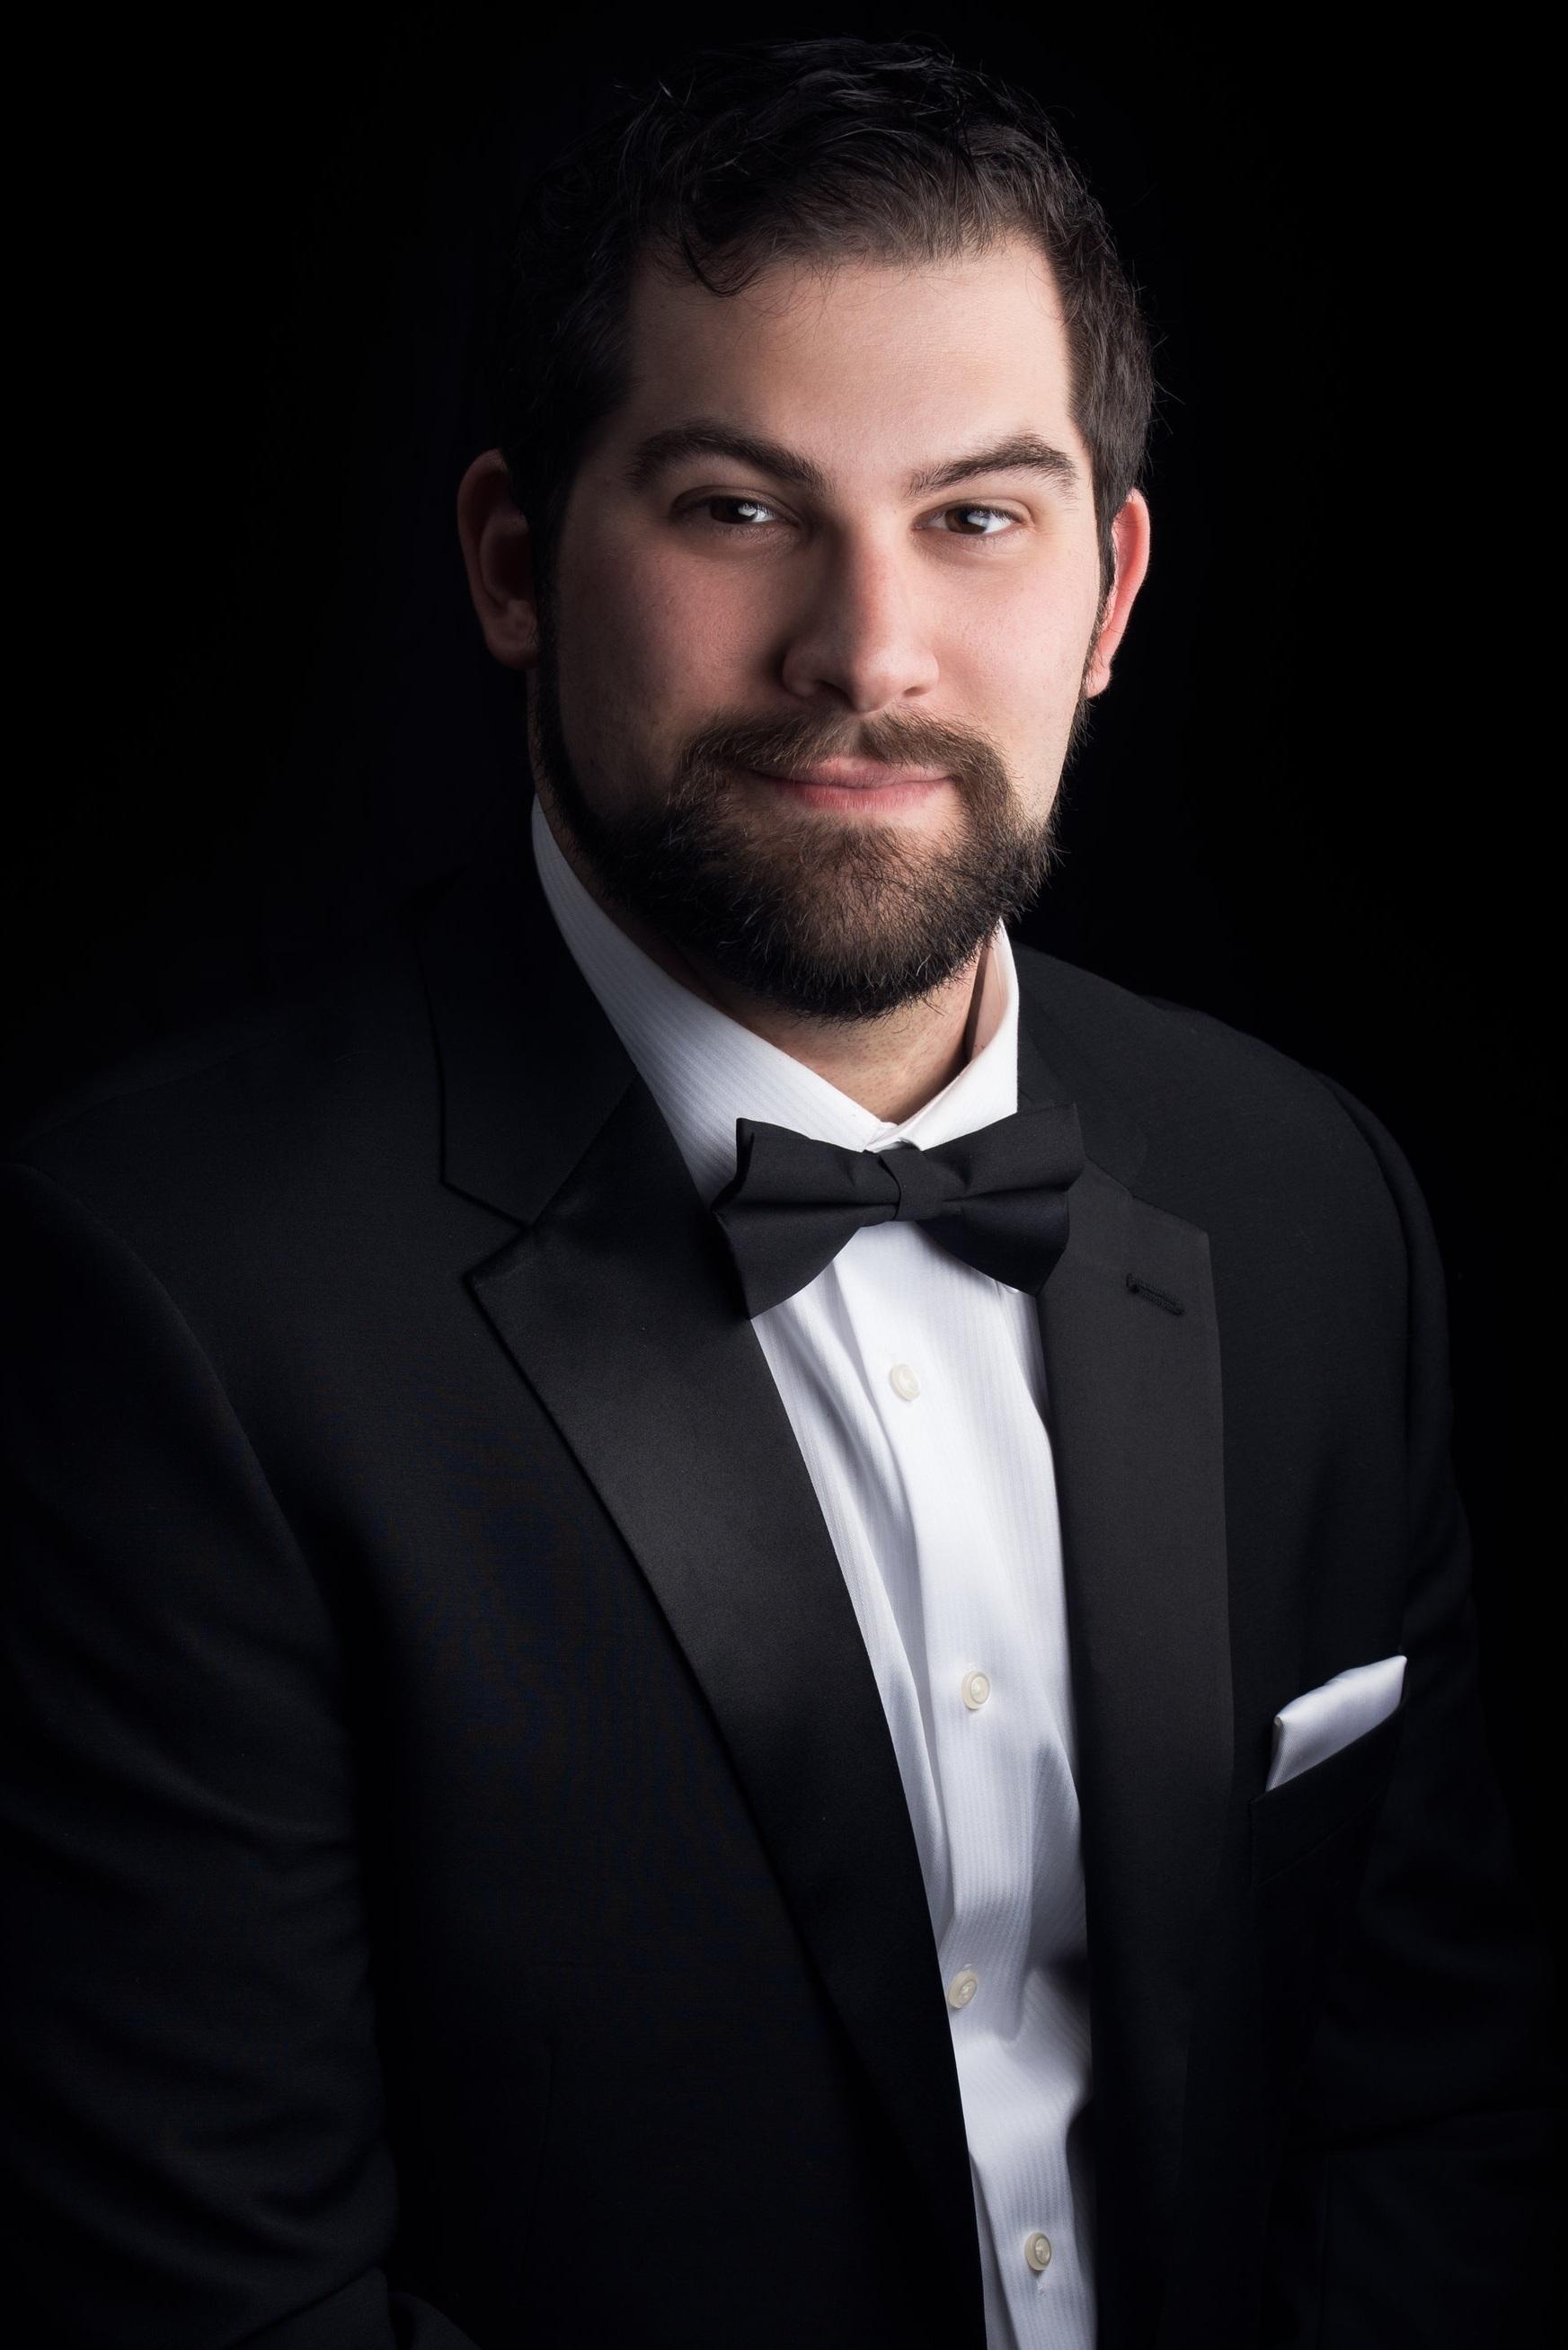 Marco Cammarota, tenor